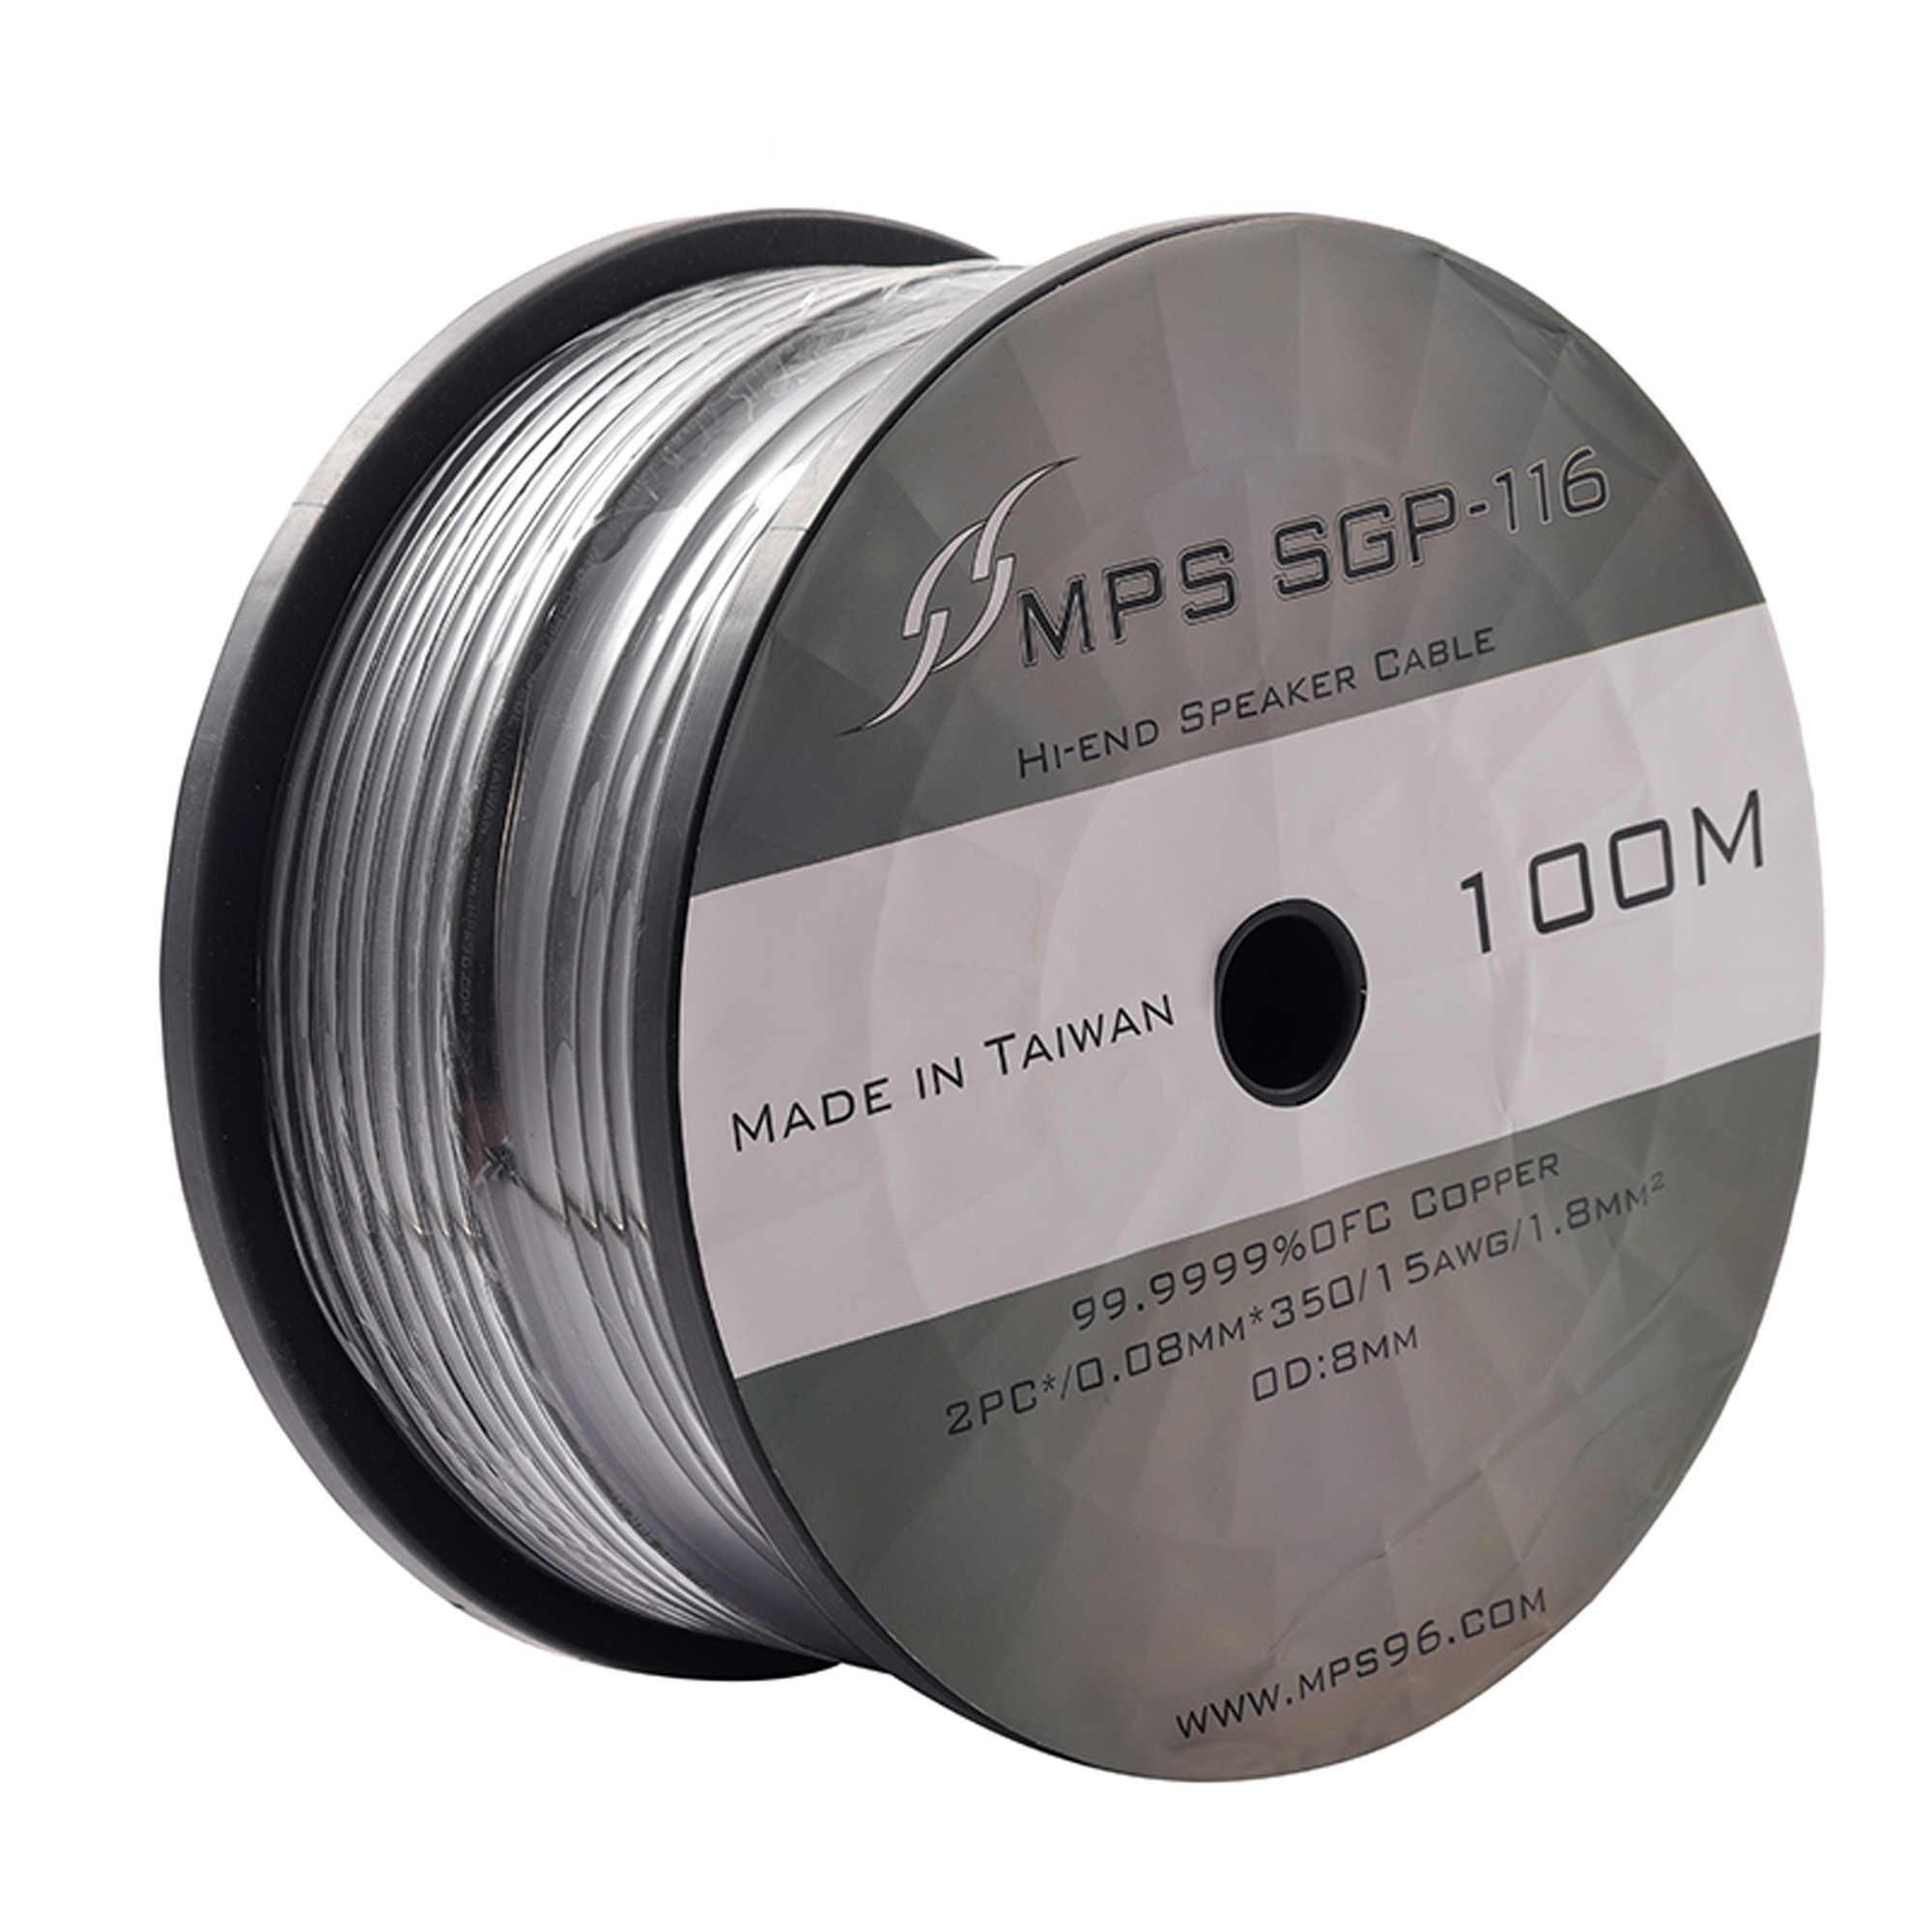 MPS SGP-116 רמקול כבל 99.99997% OFC + כסף מצופה אודיו חוט עבור HIFI CD נגן מגבר DIY רמקול כבל